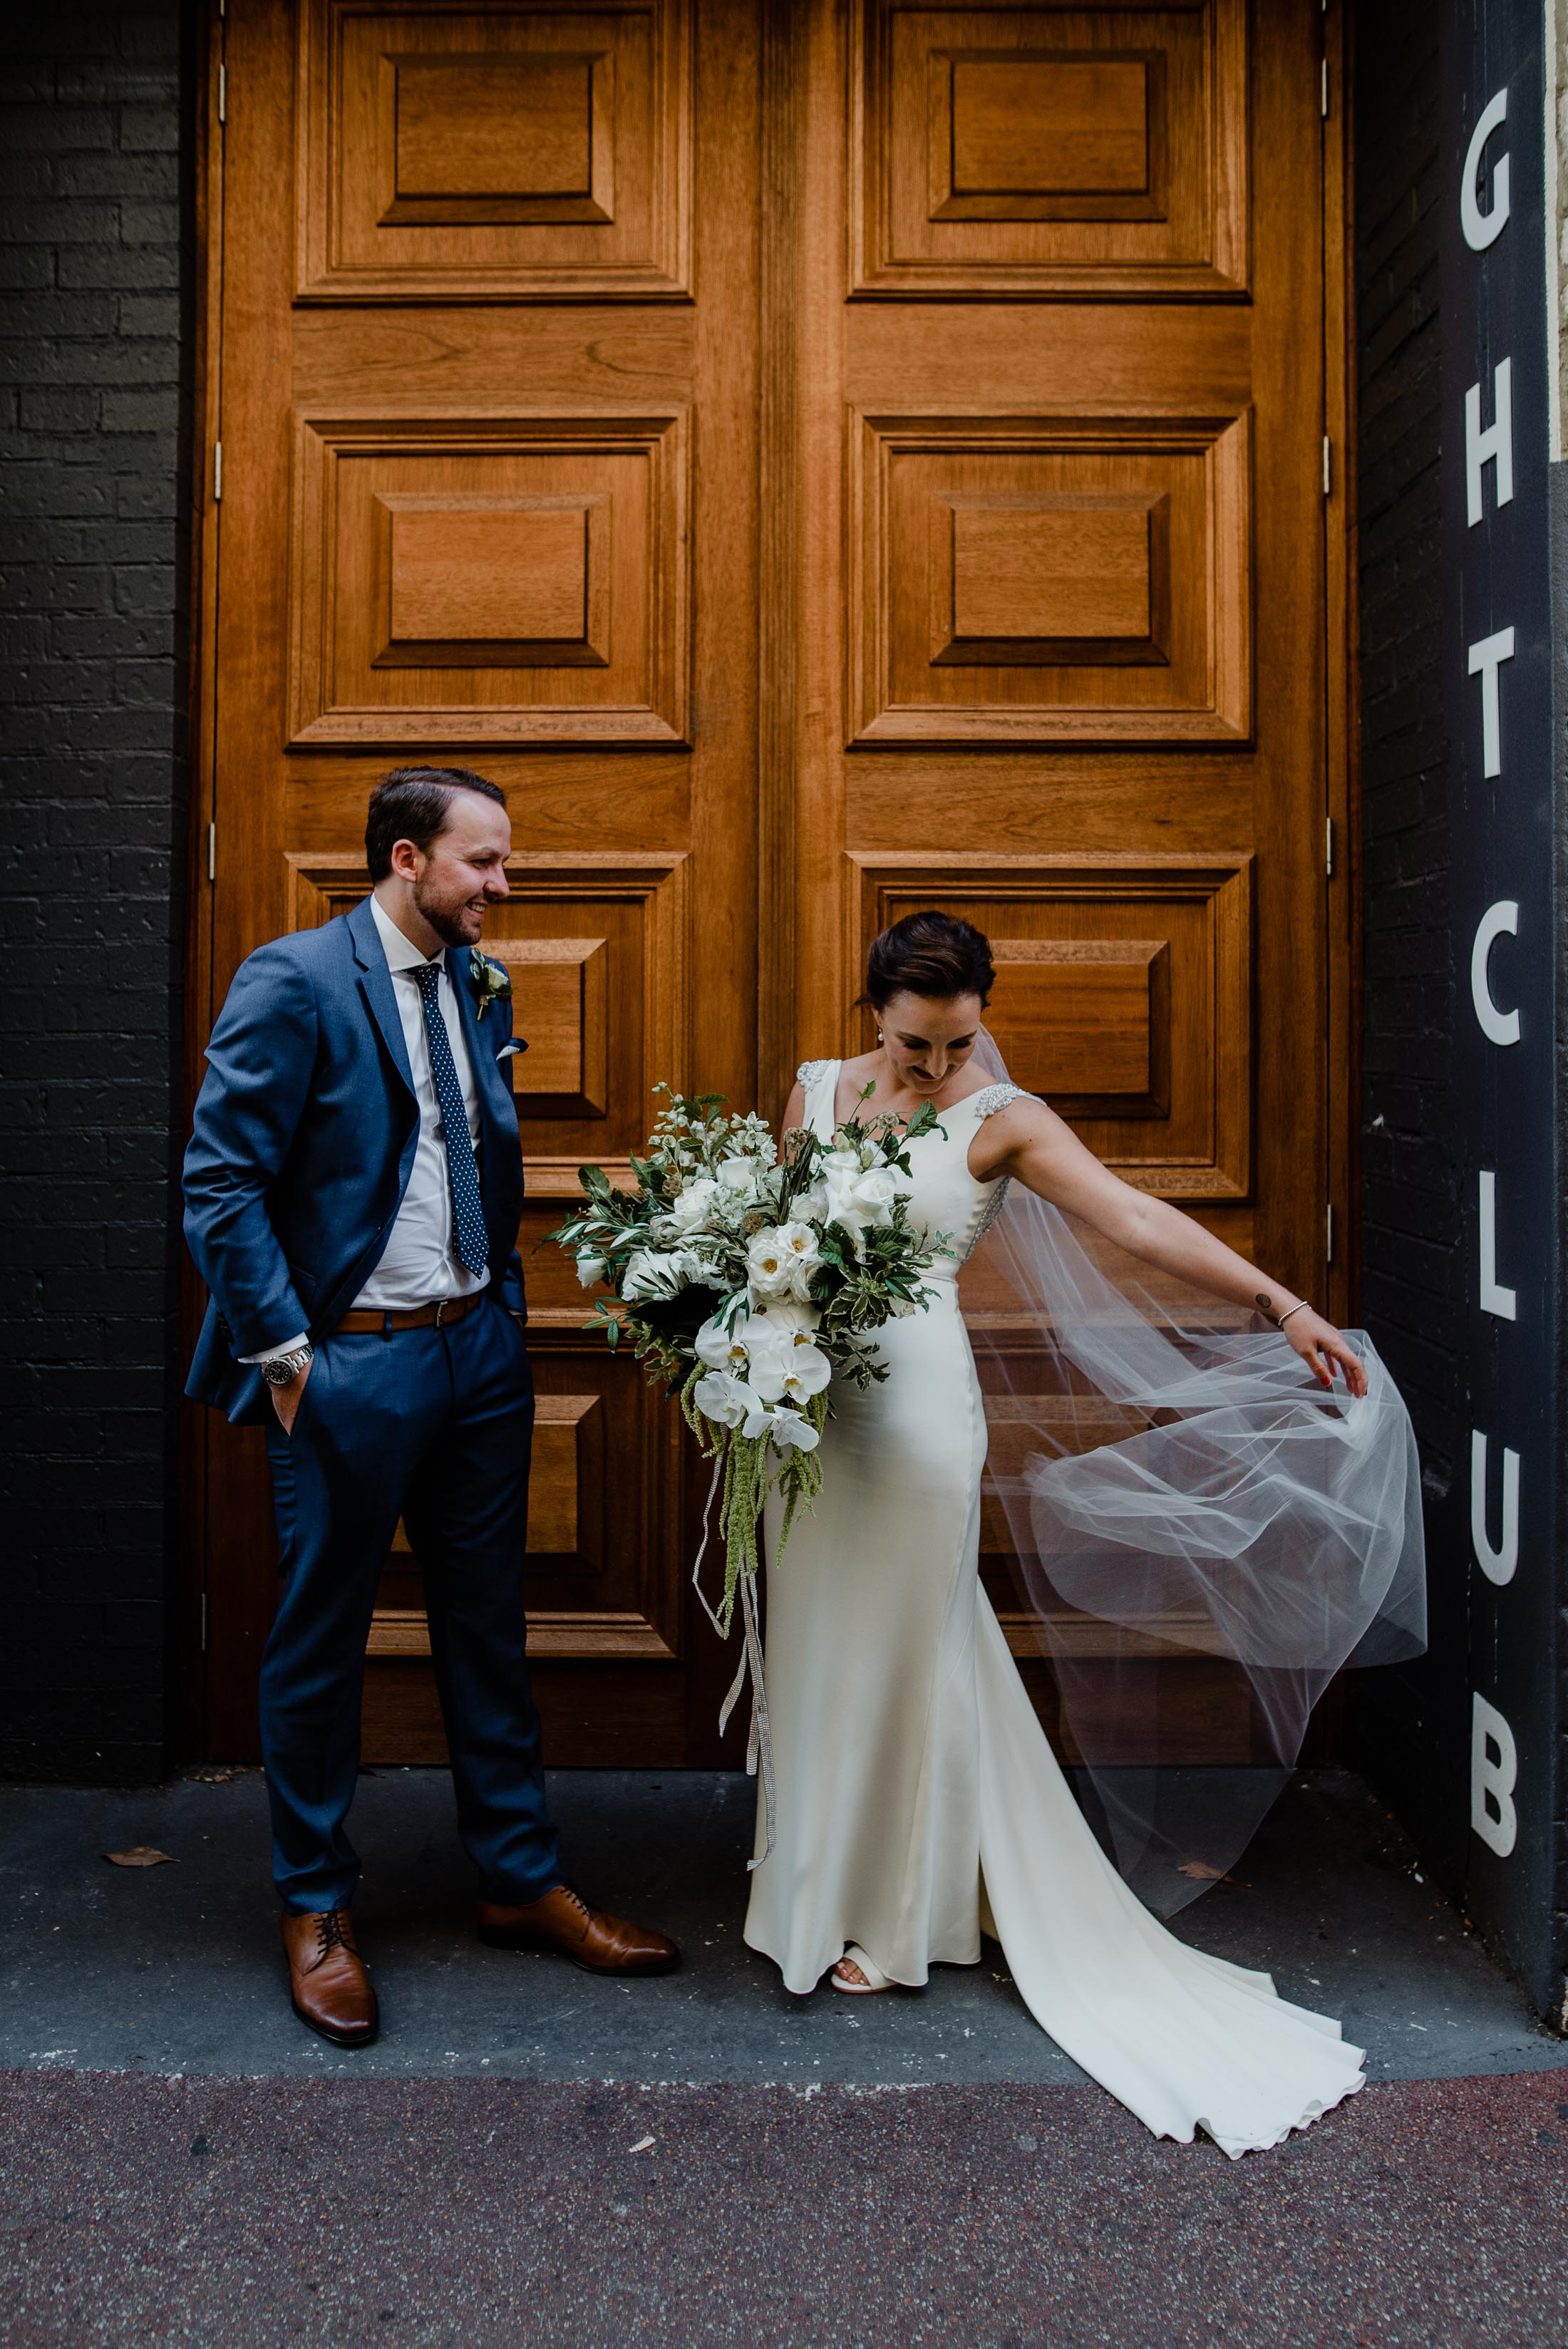 lauren-rodger-lamonts-bishops-perth-wedding-3.JPG